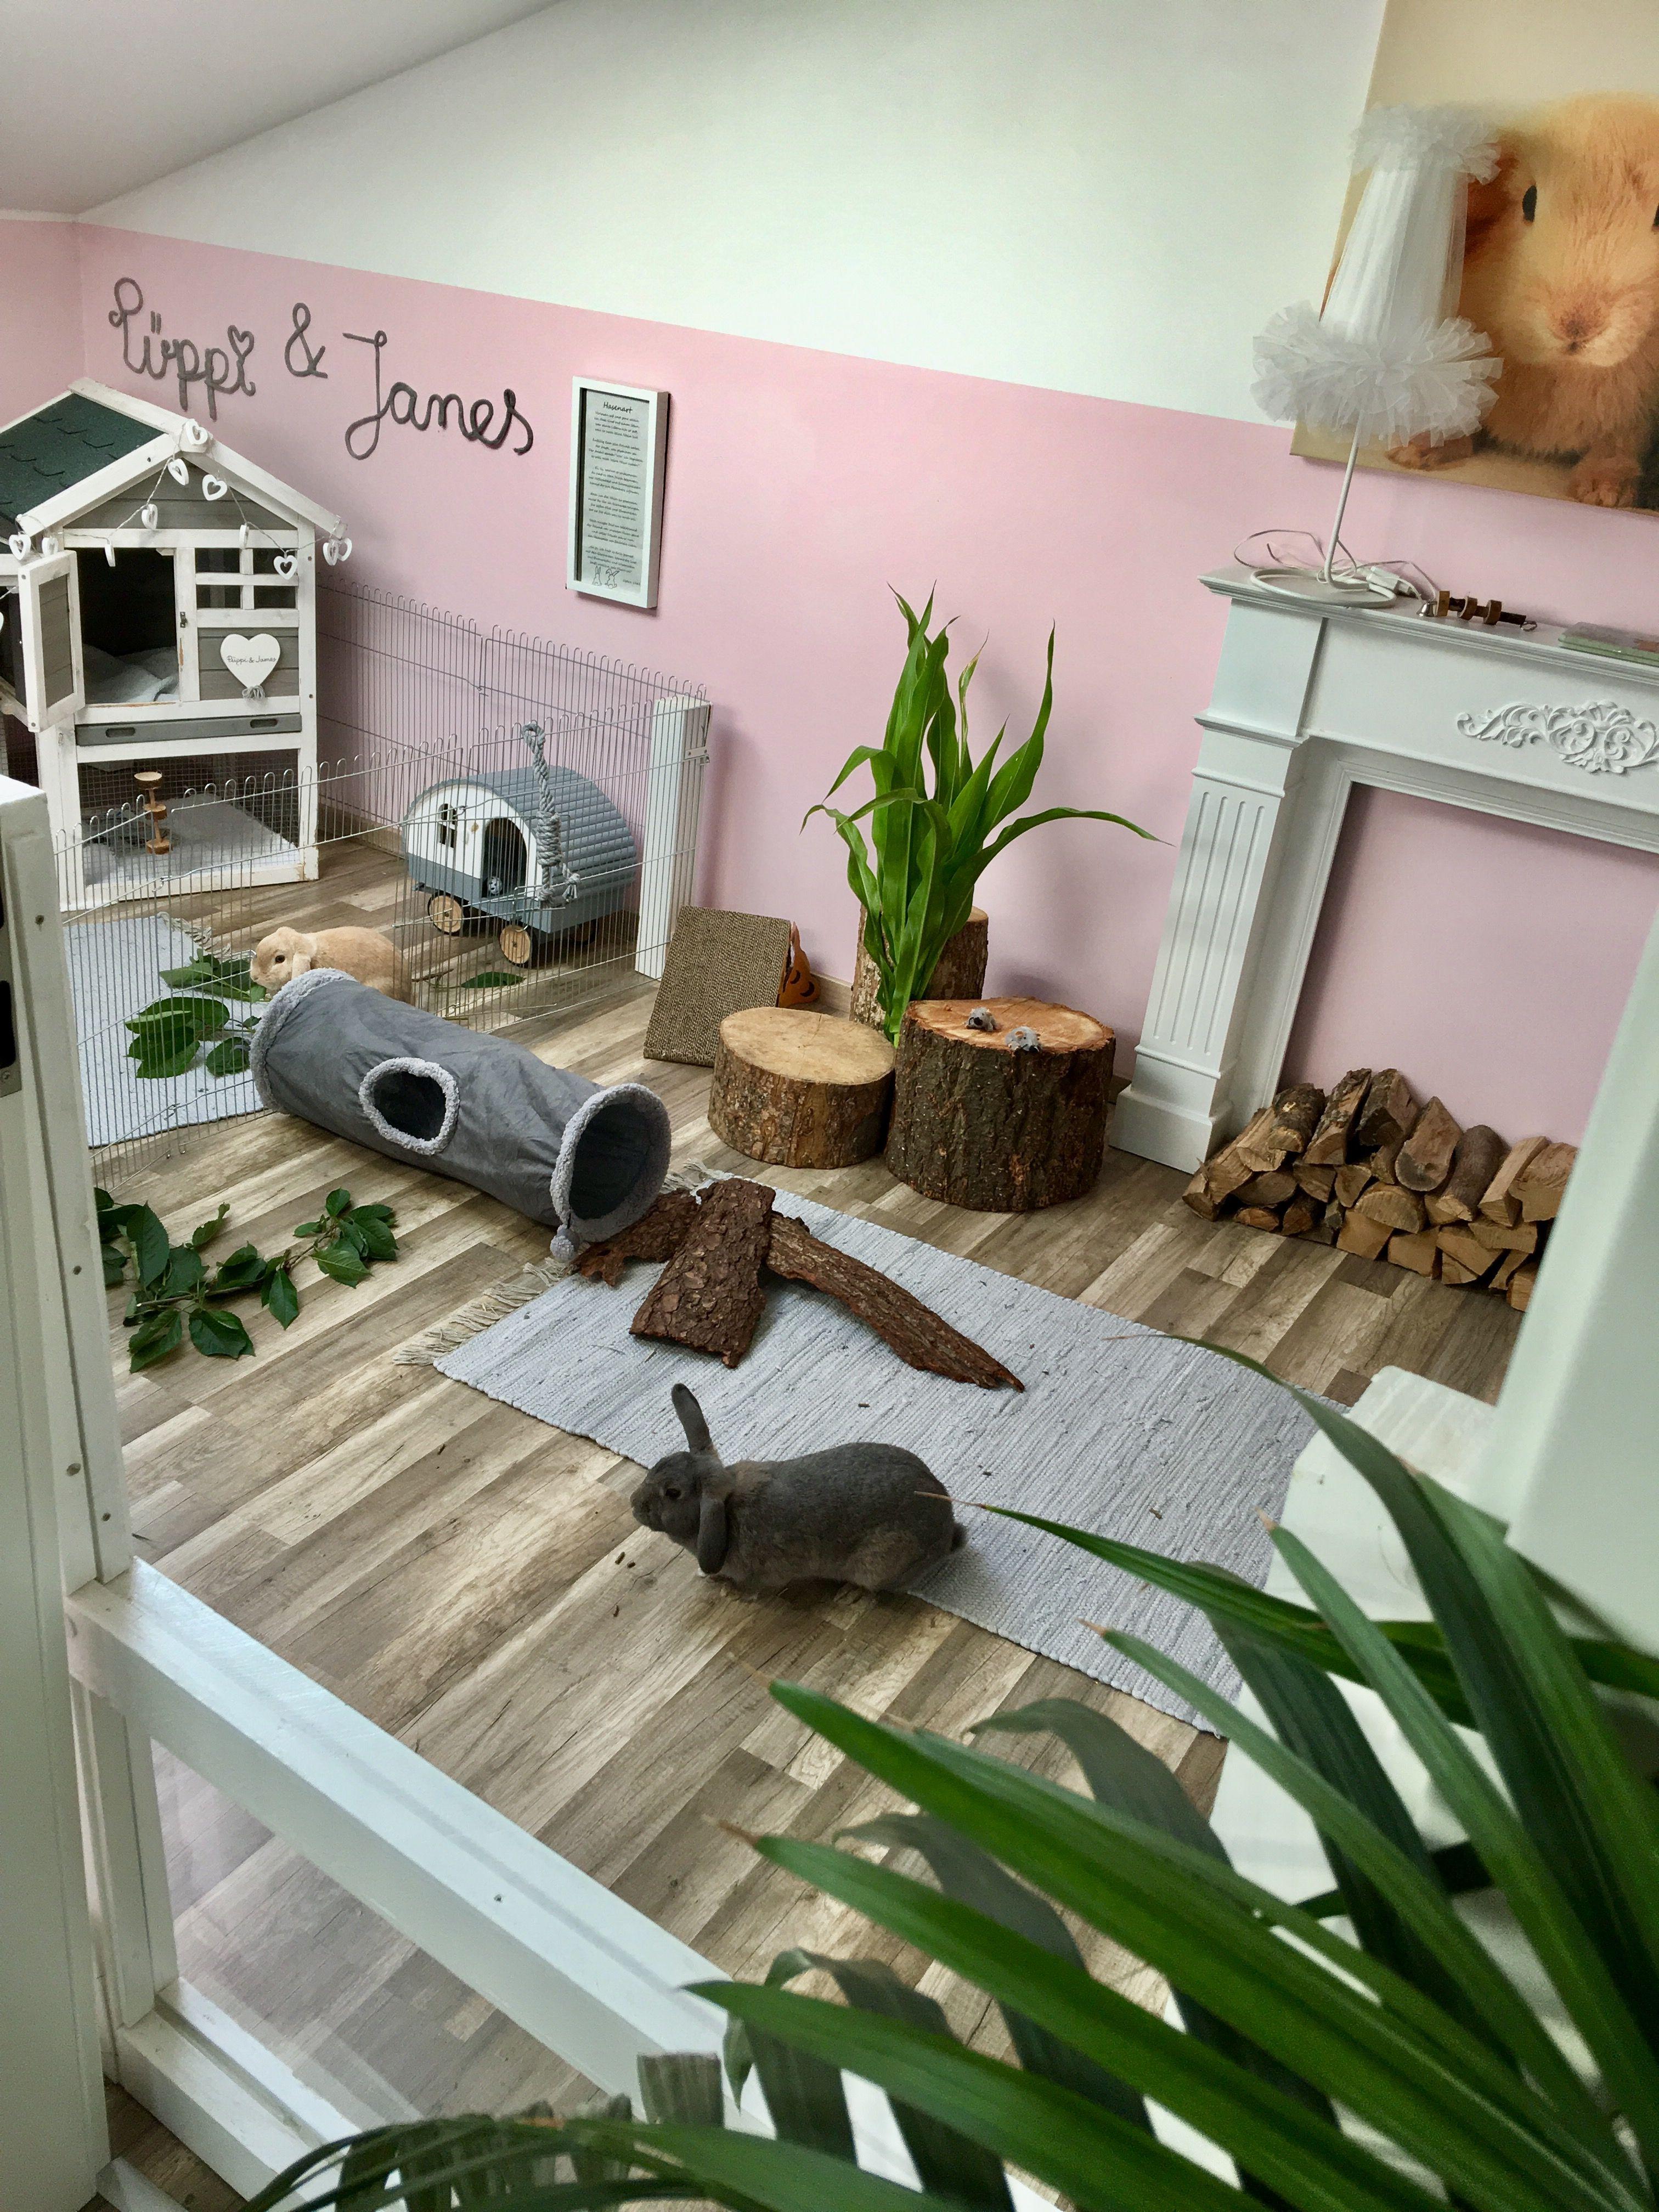 Pin By Melissa Stauffer On Kaninchenparadies Puppijames Bunny Cages Indoor Rabbit Indoor Rabbit Cage